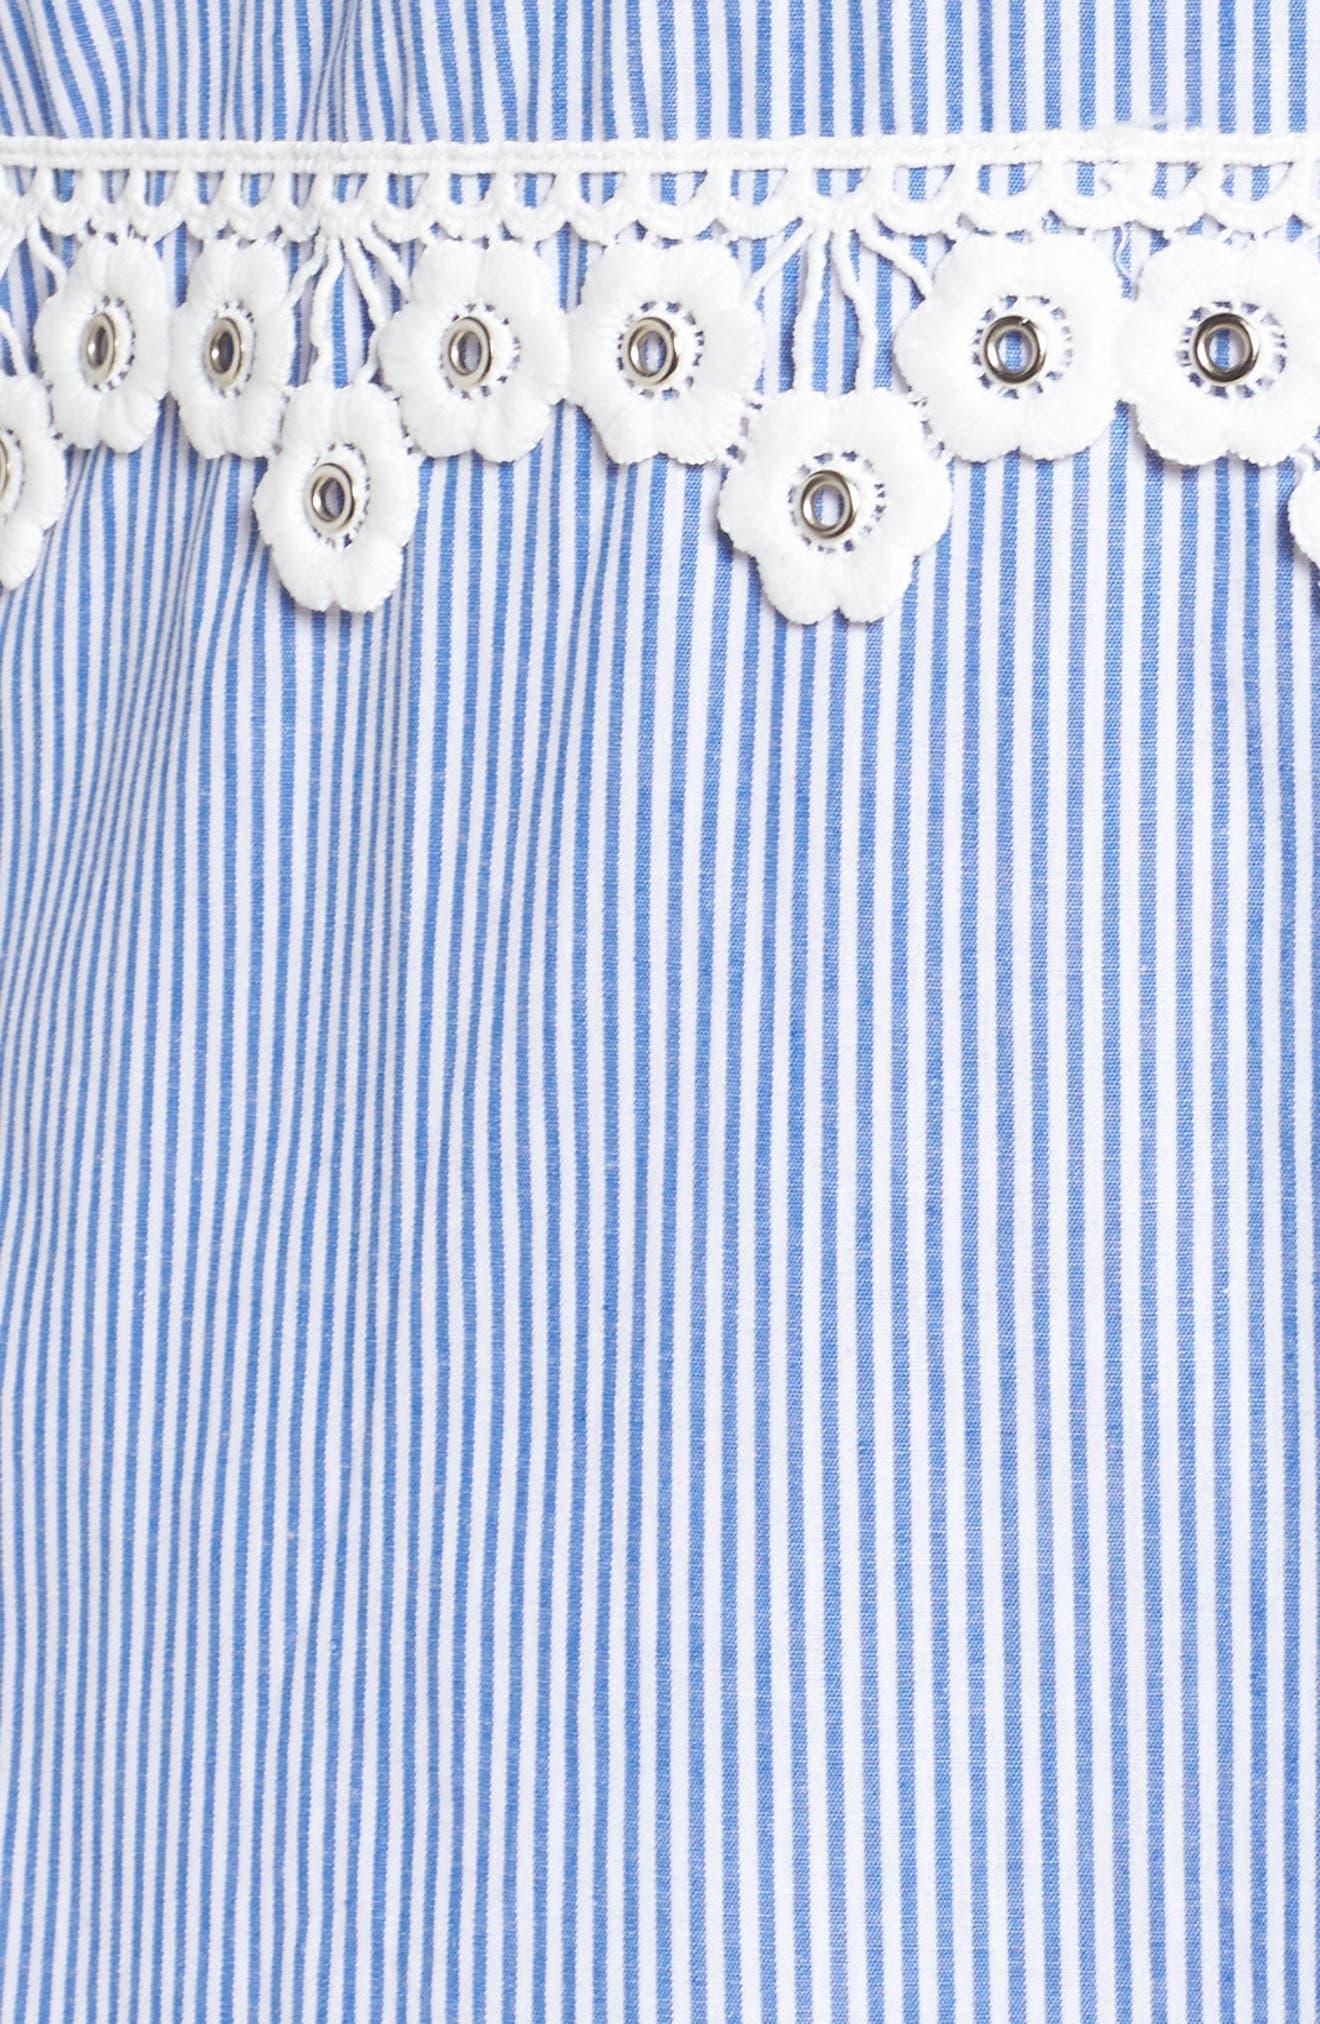 Flower Waist Stripe Shirtdress,                             Alternate thumbnail 5, color,                             Blue White Stripe